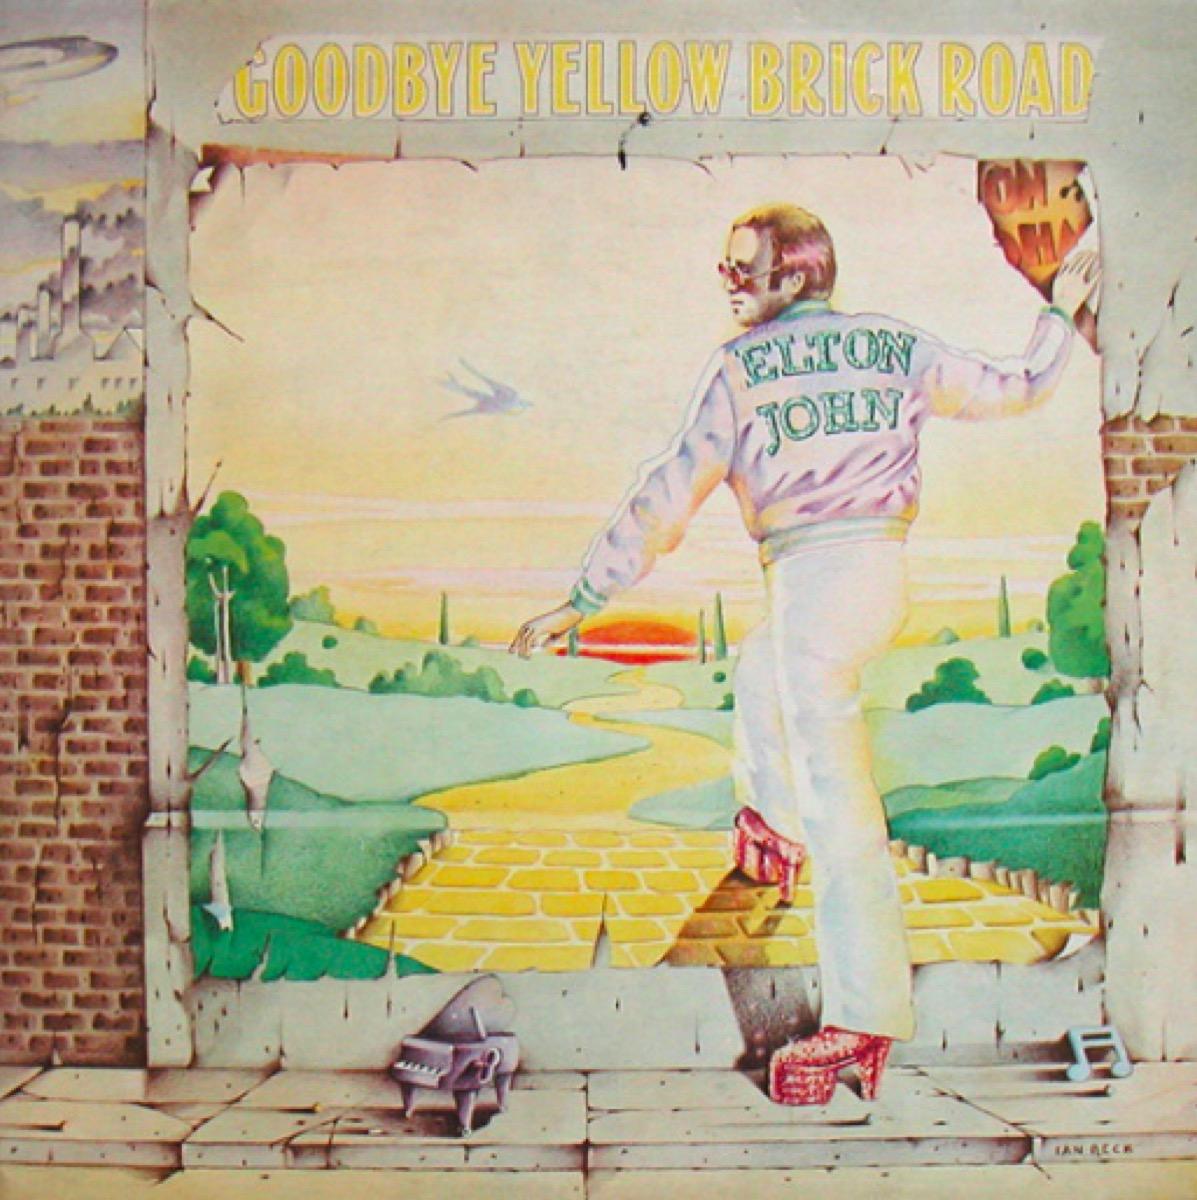 Goodbye Yellow Brick Road album